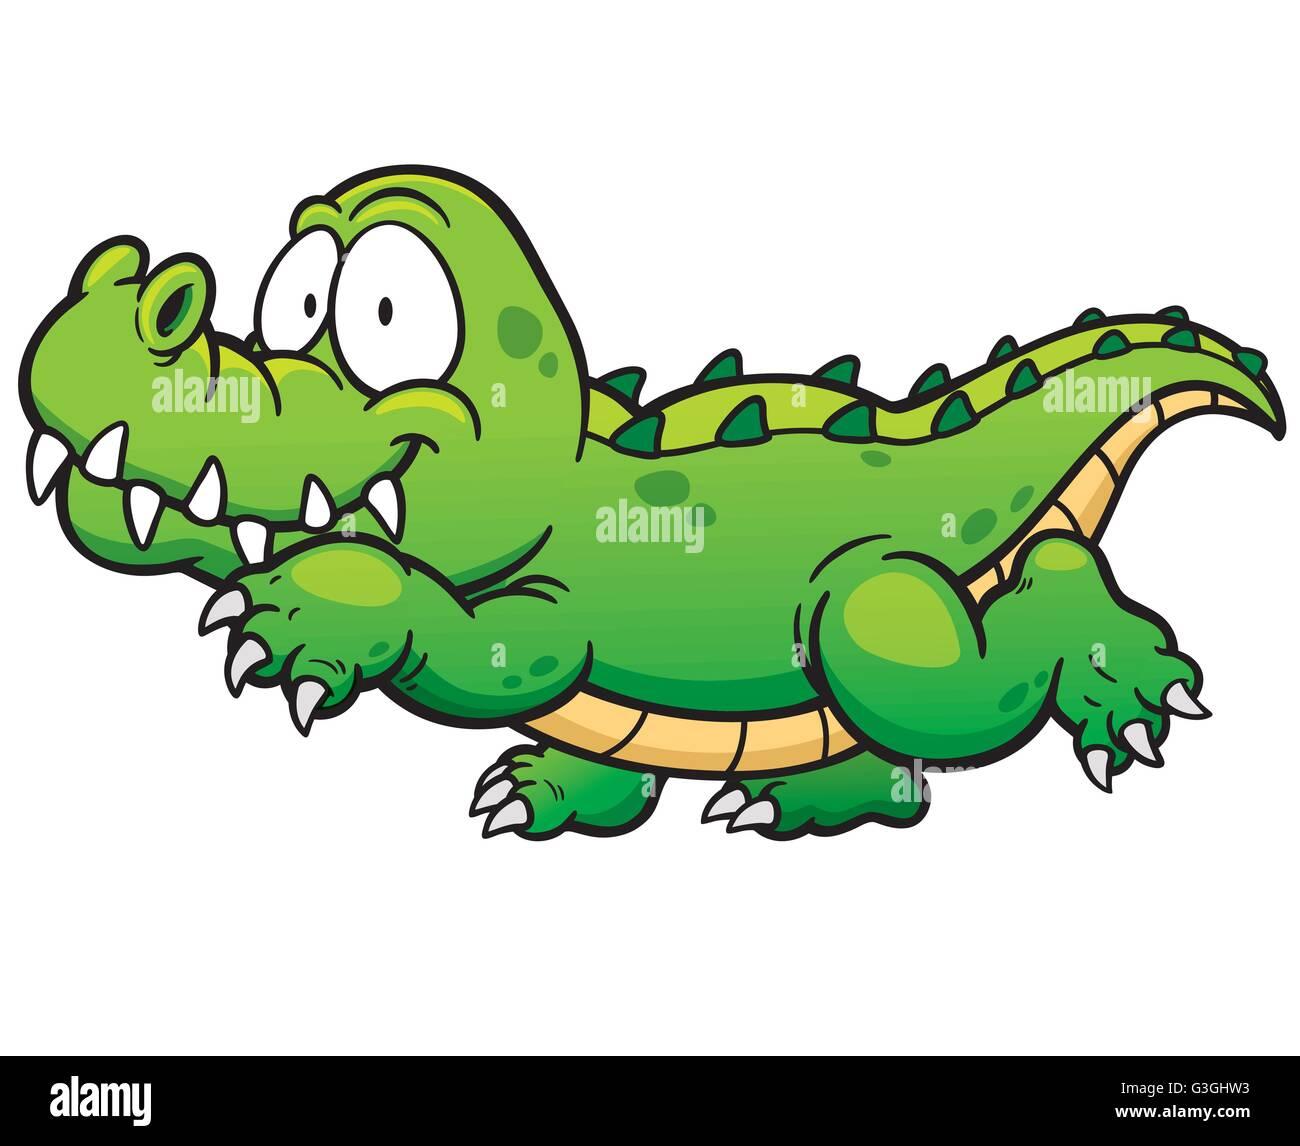 Vector illustration de crocodile dessin anim vecteurs et illustration image vectorielle - Dessin anime crocodile ...